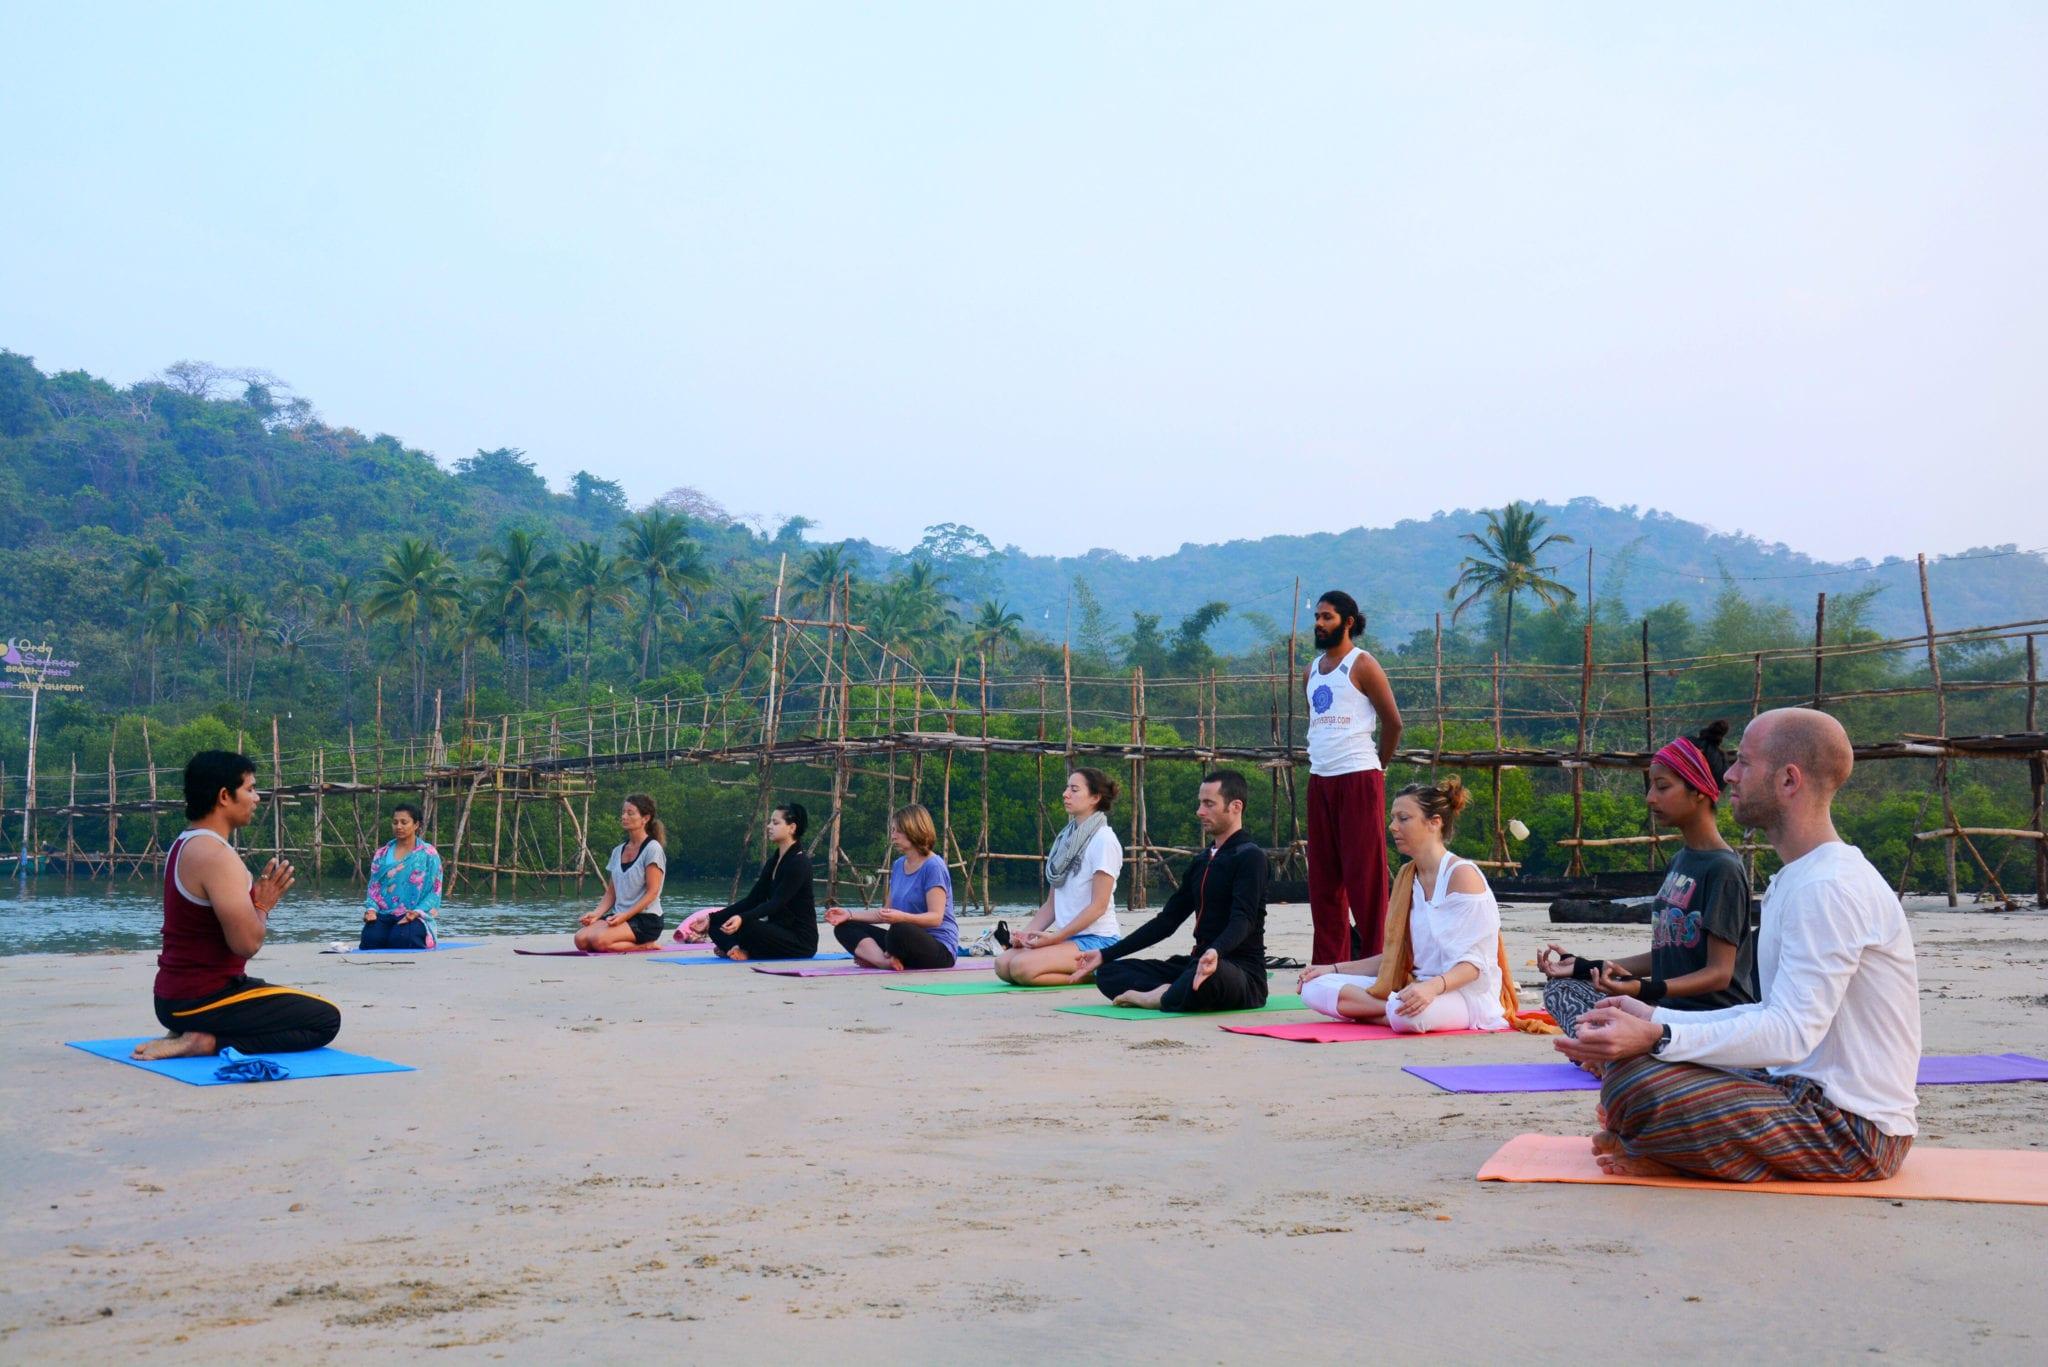 200 Hrs Holistic Yoga Teacher Trainings in Goa, India